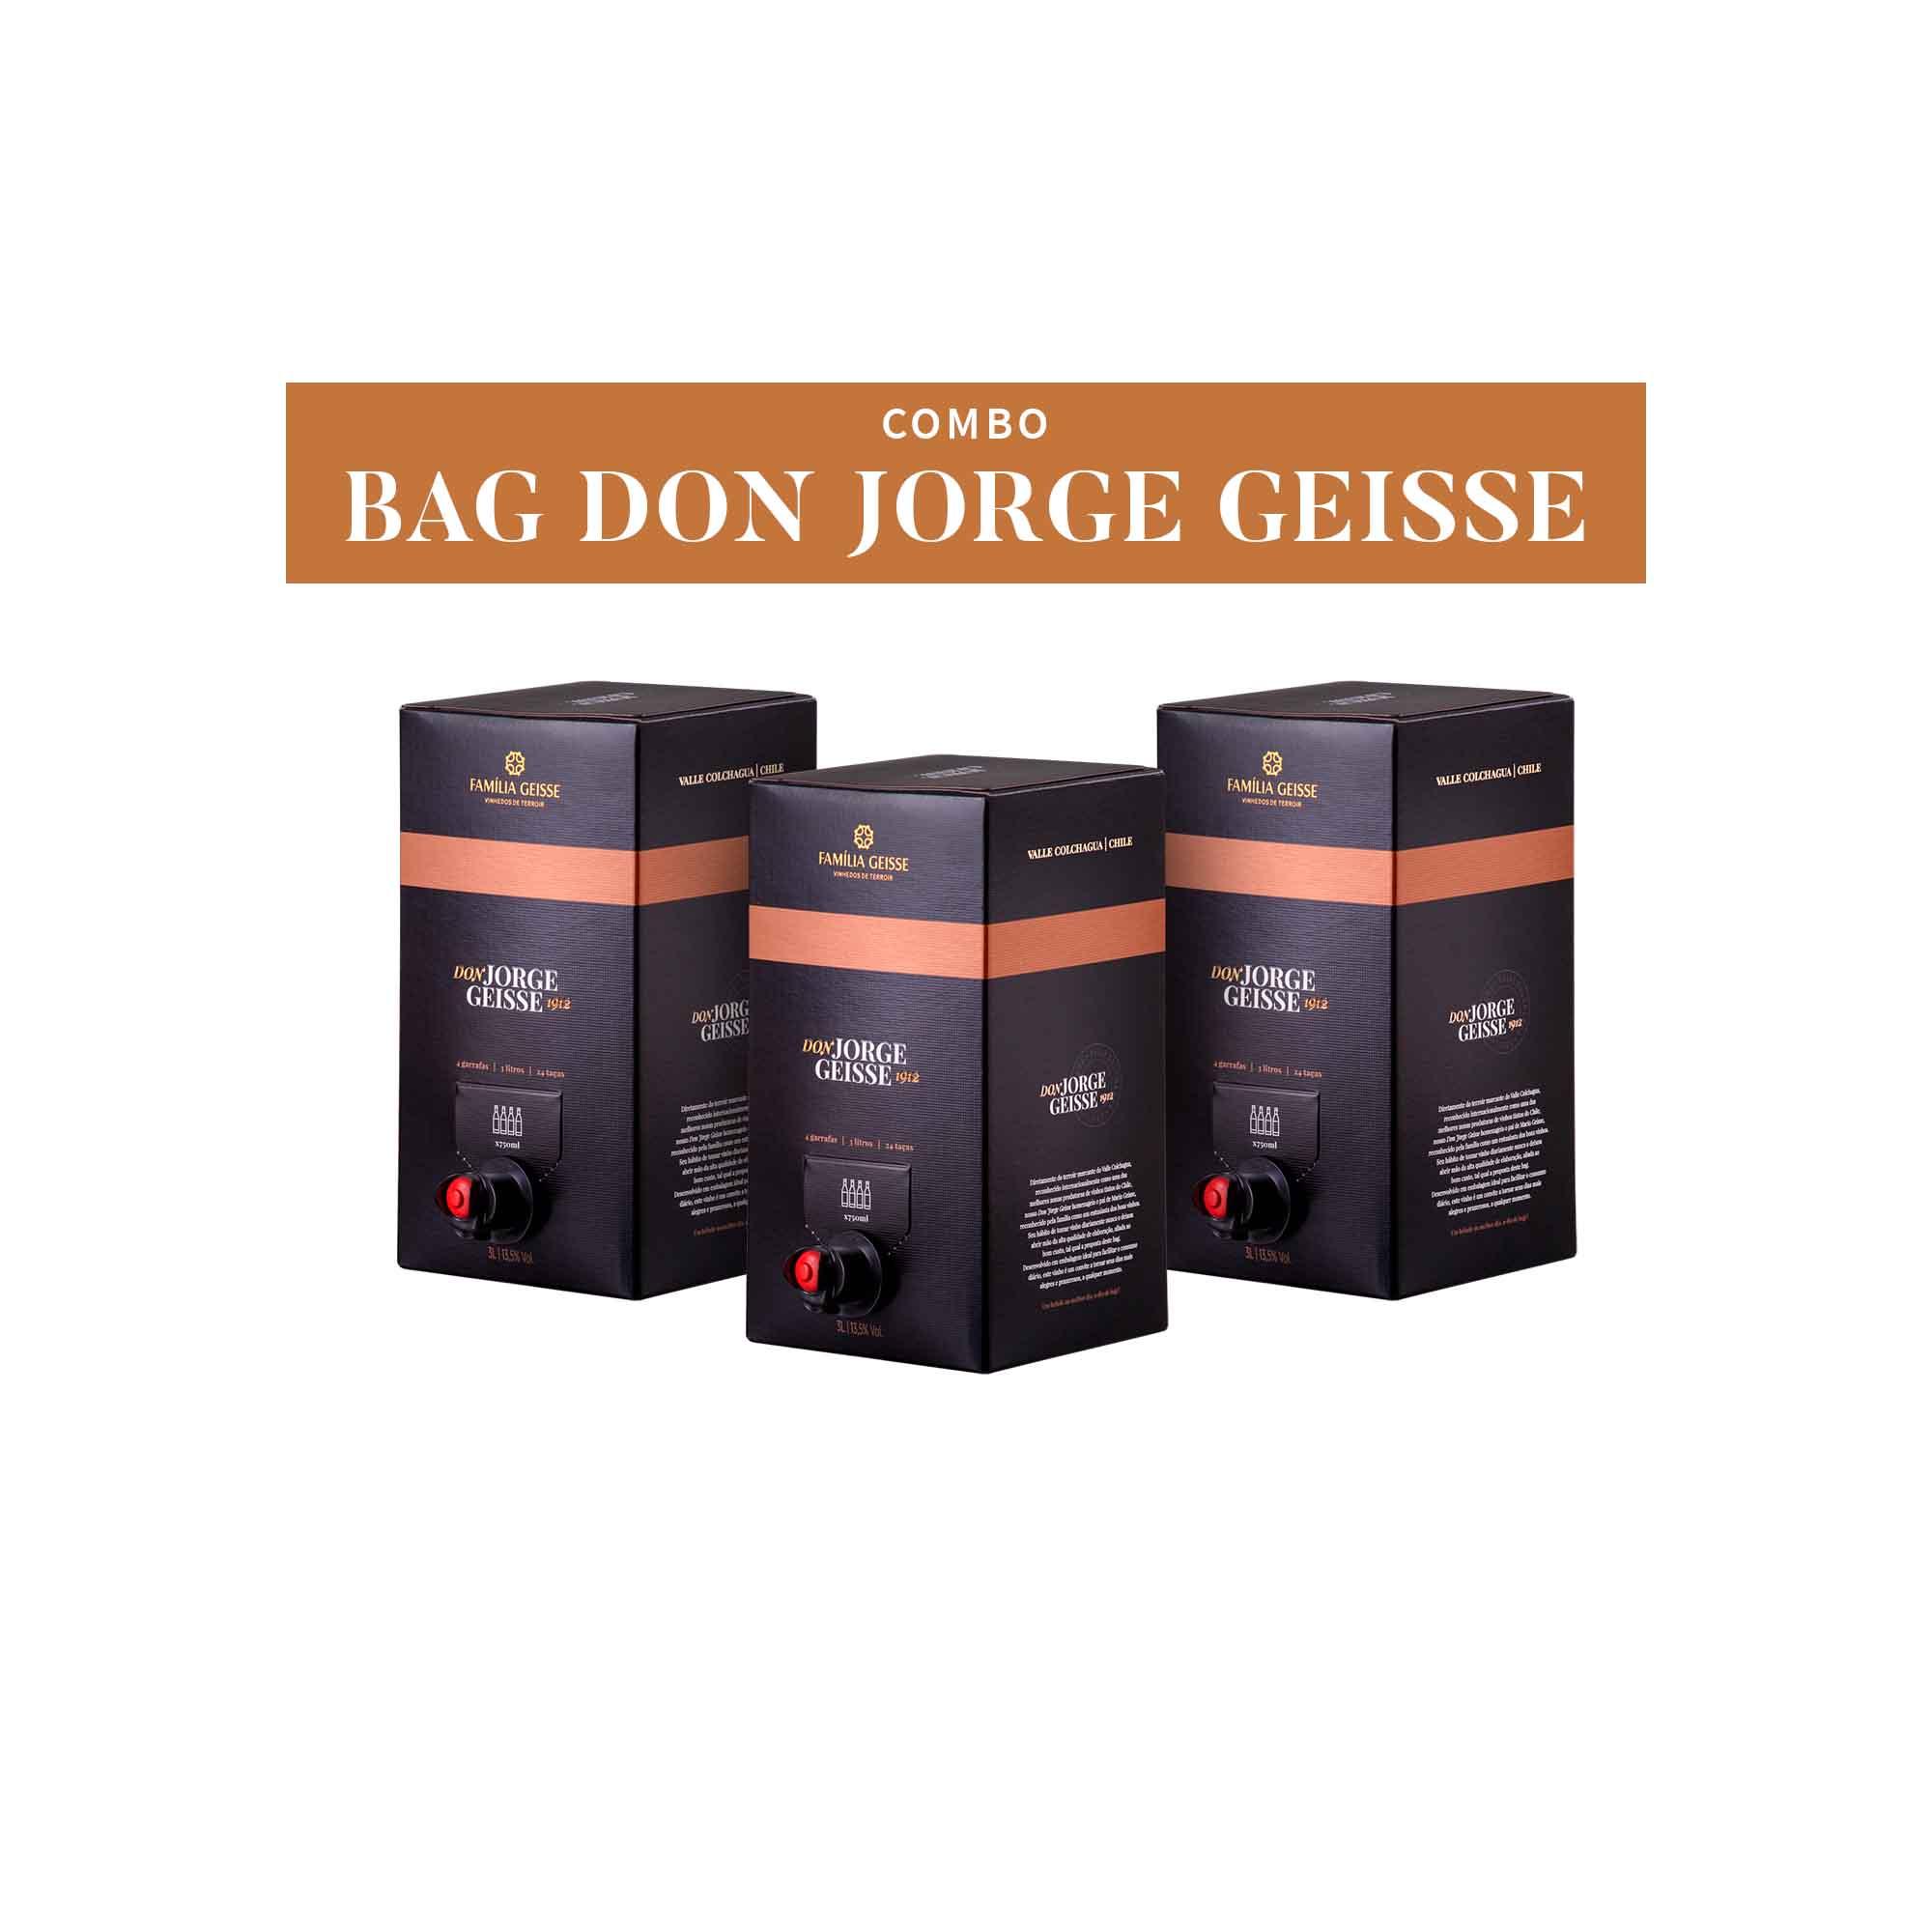 COMBO BAG DON JORGE GEISSE - 3 BAGS